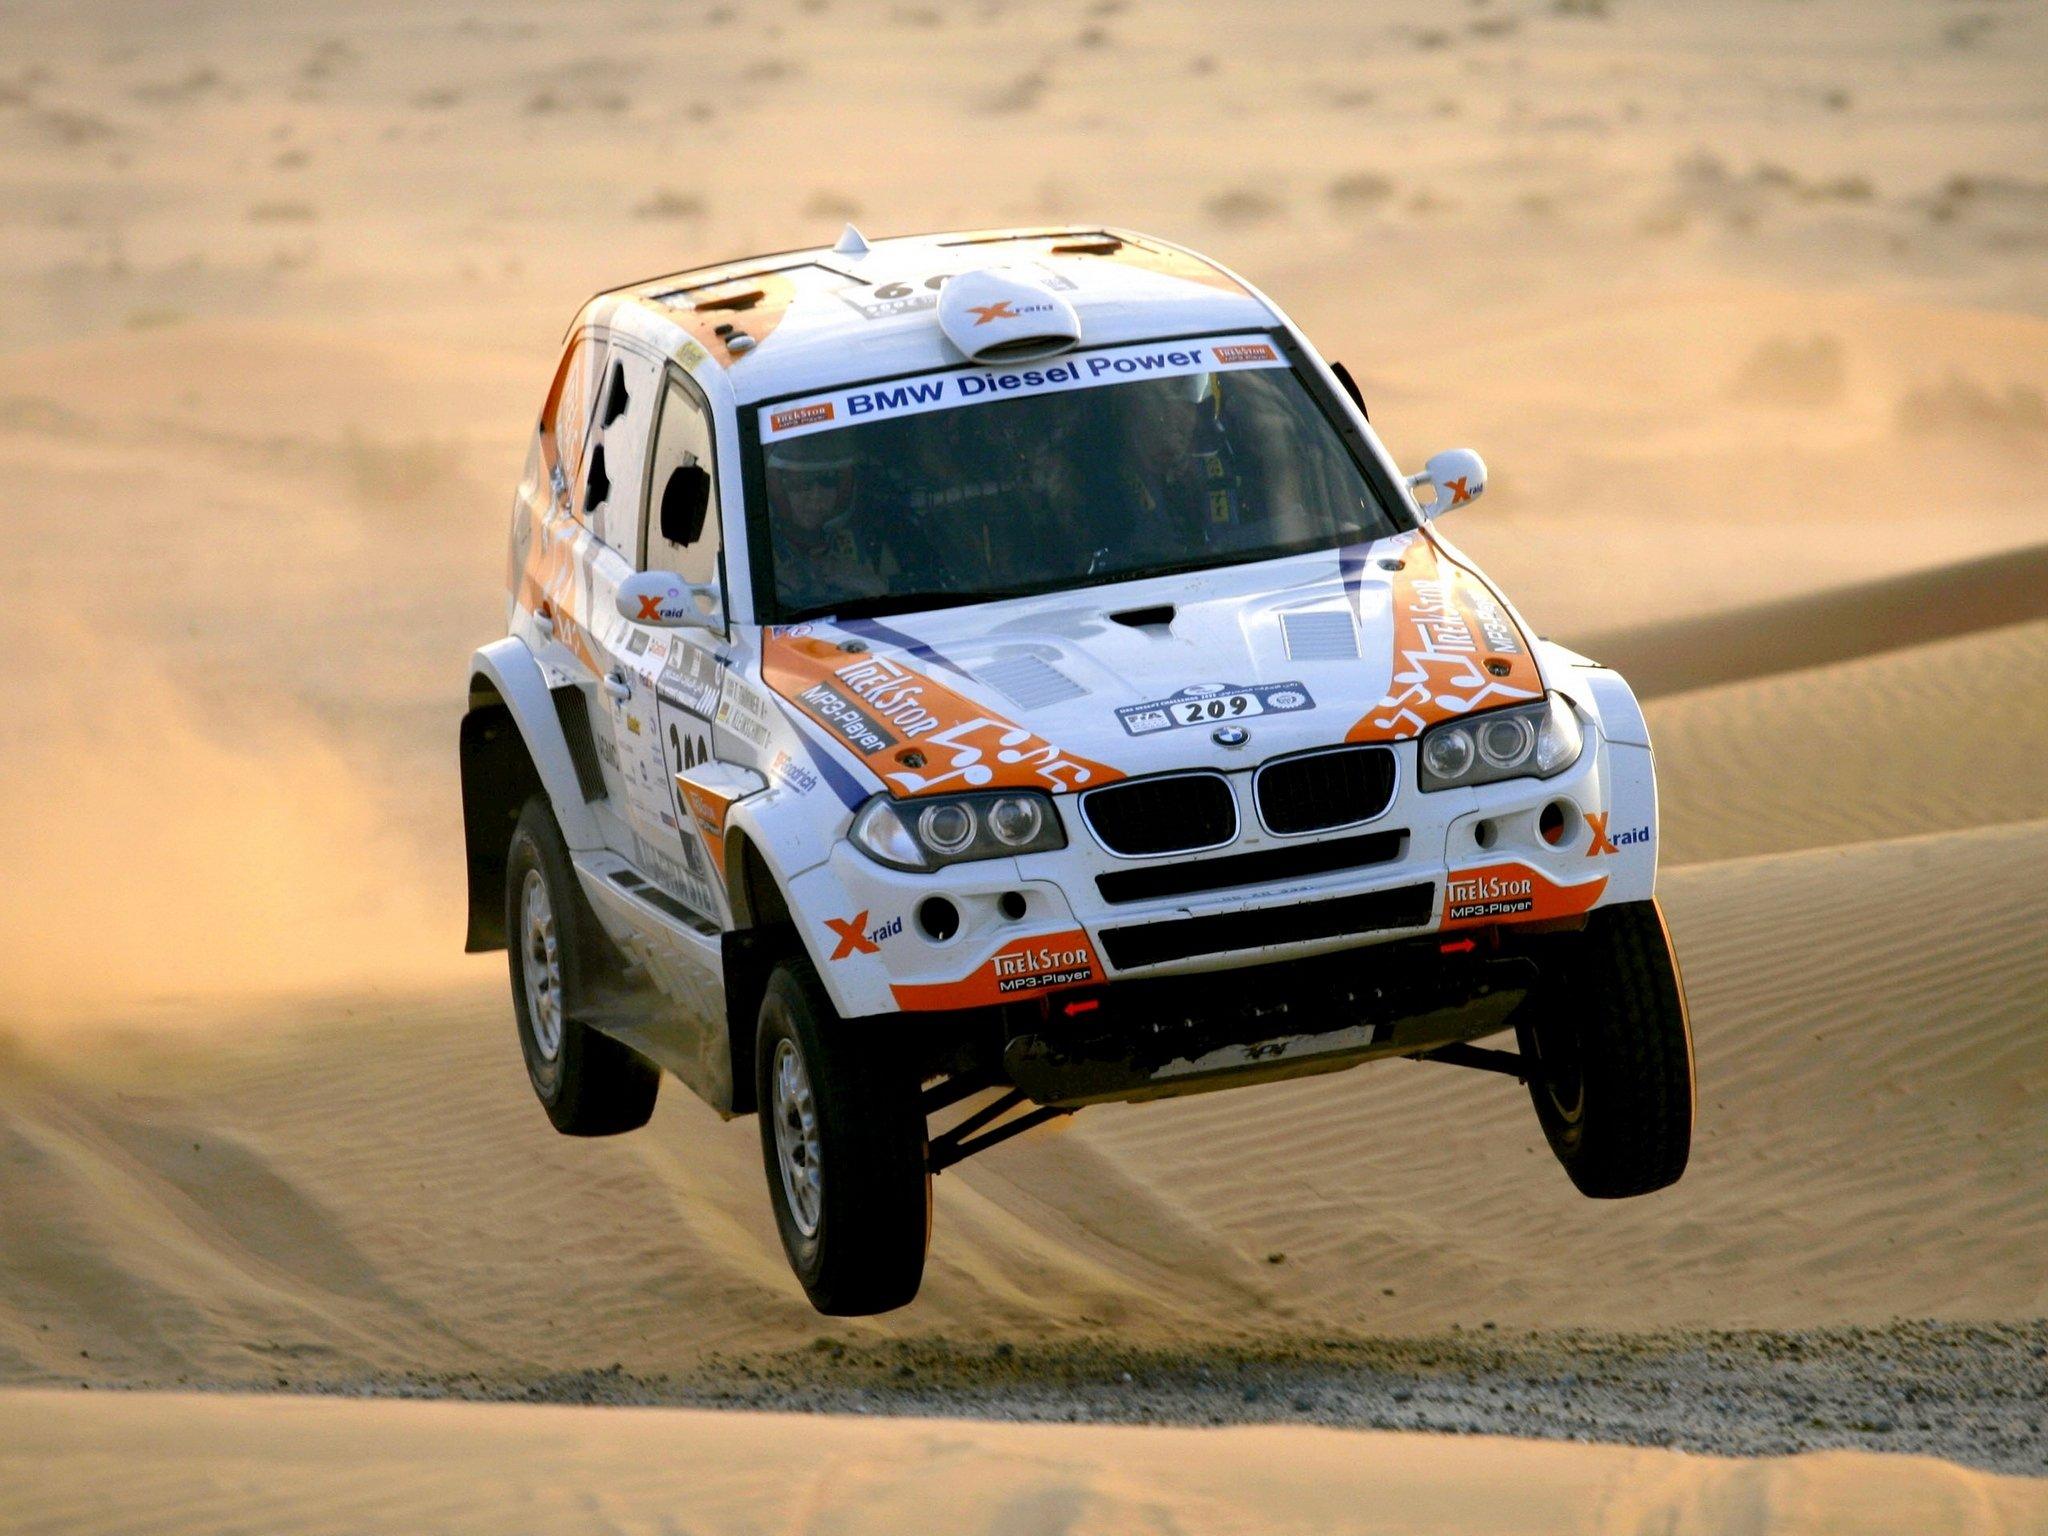 2006 bmw x 3 c c e83 dakar race racing rally offroad suv. Black Bedroom Furniture Sets. Home Design Ideas